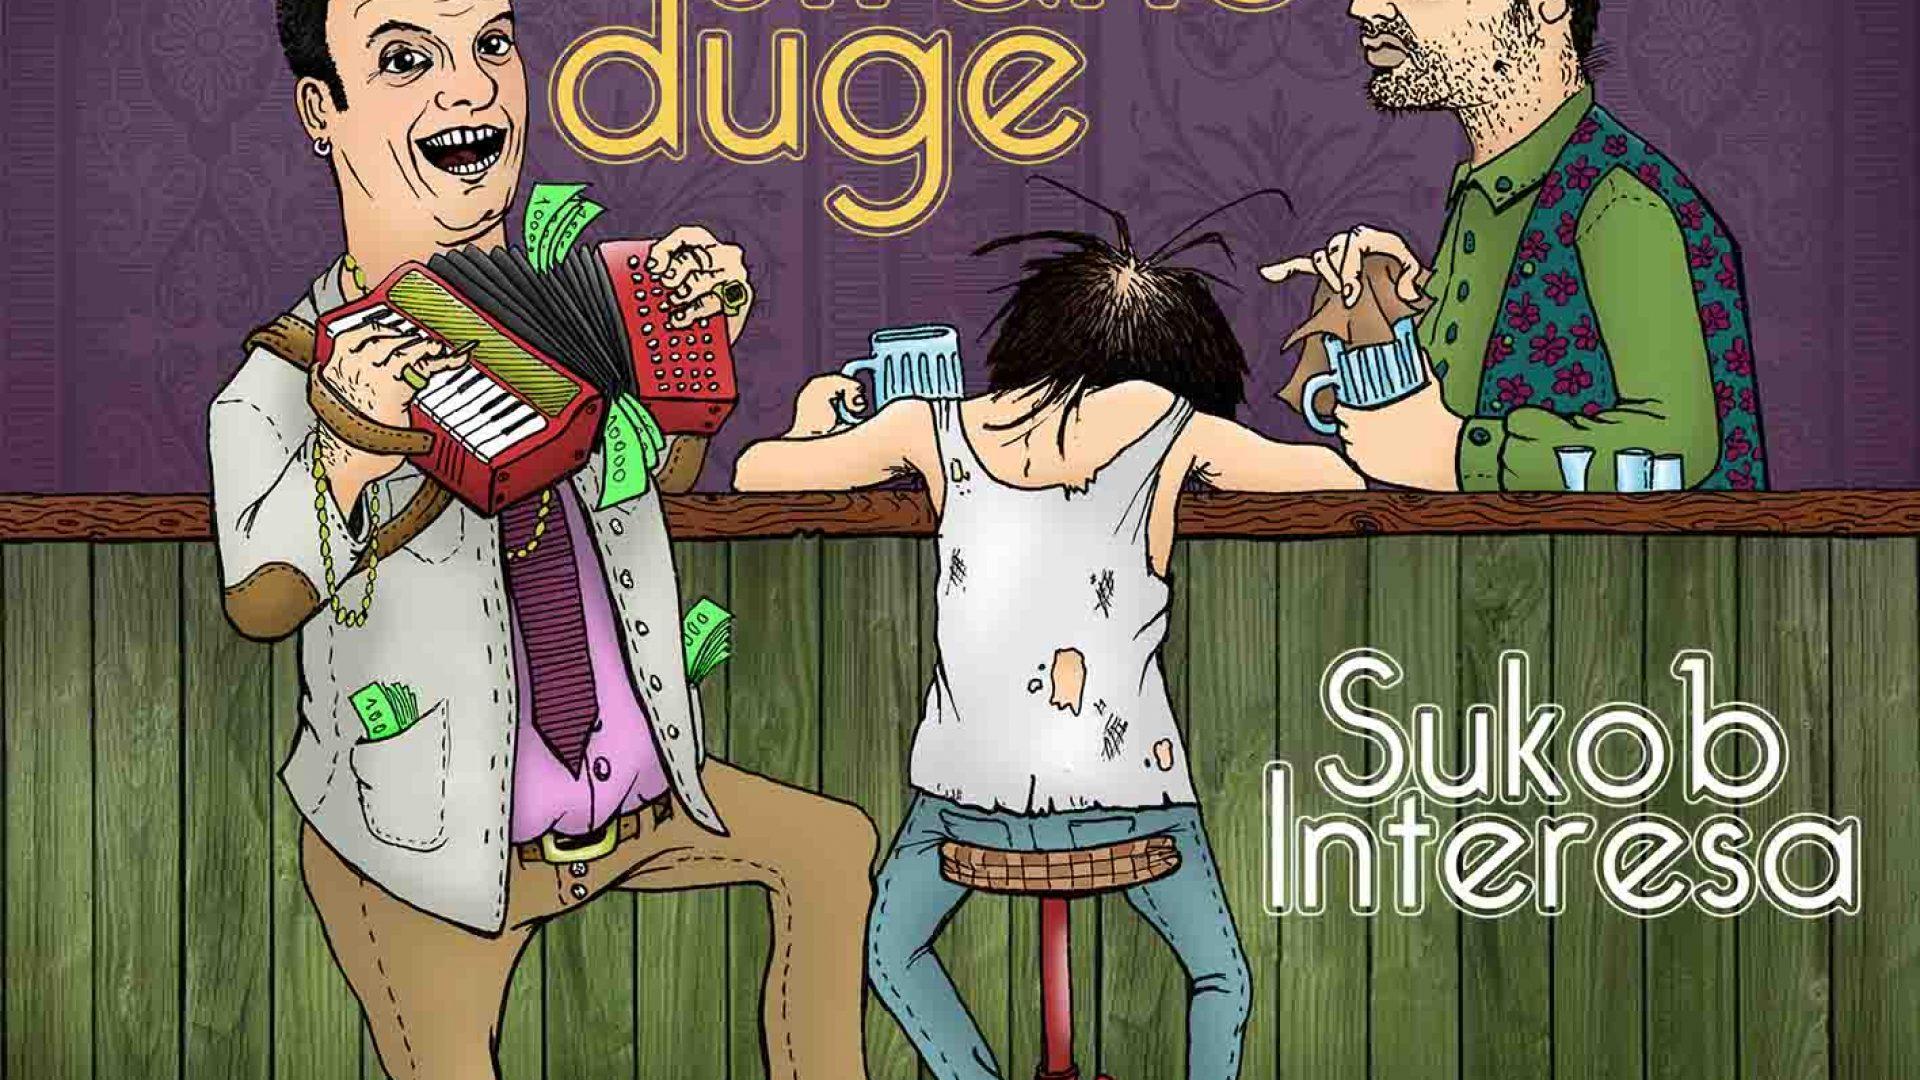 (2013.) Sukob Interesa – Sa Ove Strane Duge